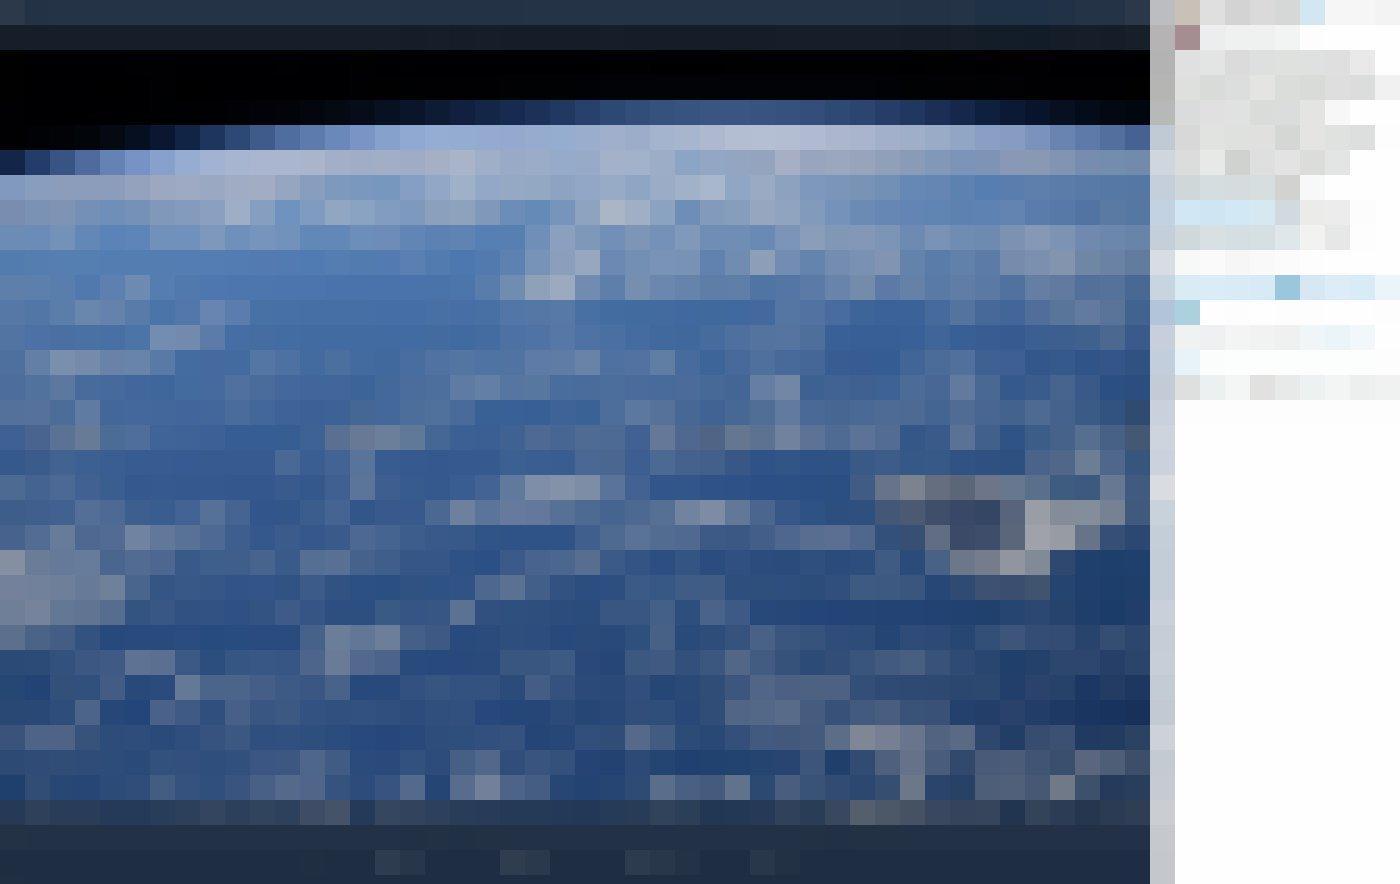 Zum Earth Day 2020präsentiert die Astronautin Christina H. Koch vier Bilder: Hawaii, Alpen, Sahara, Australien.